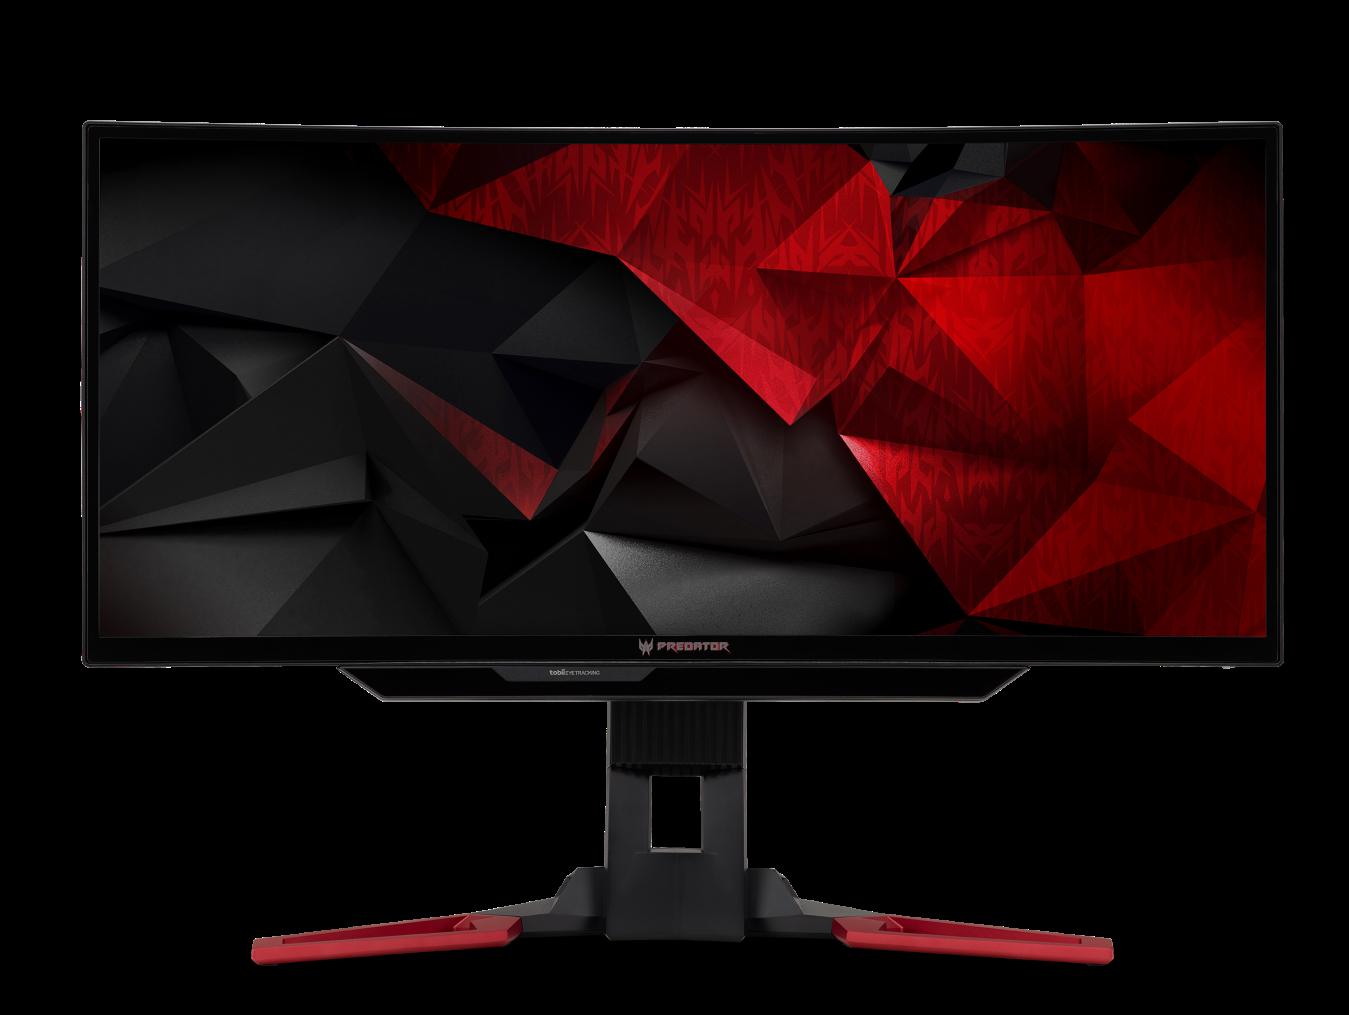 "29,5"" LCD Acer Predator Z301CT - VA,UWHD,4ms,144Hz,300cd/m2, 100M:1,21:9,HDMI,DP,USB,repro,TobiiEye"